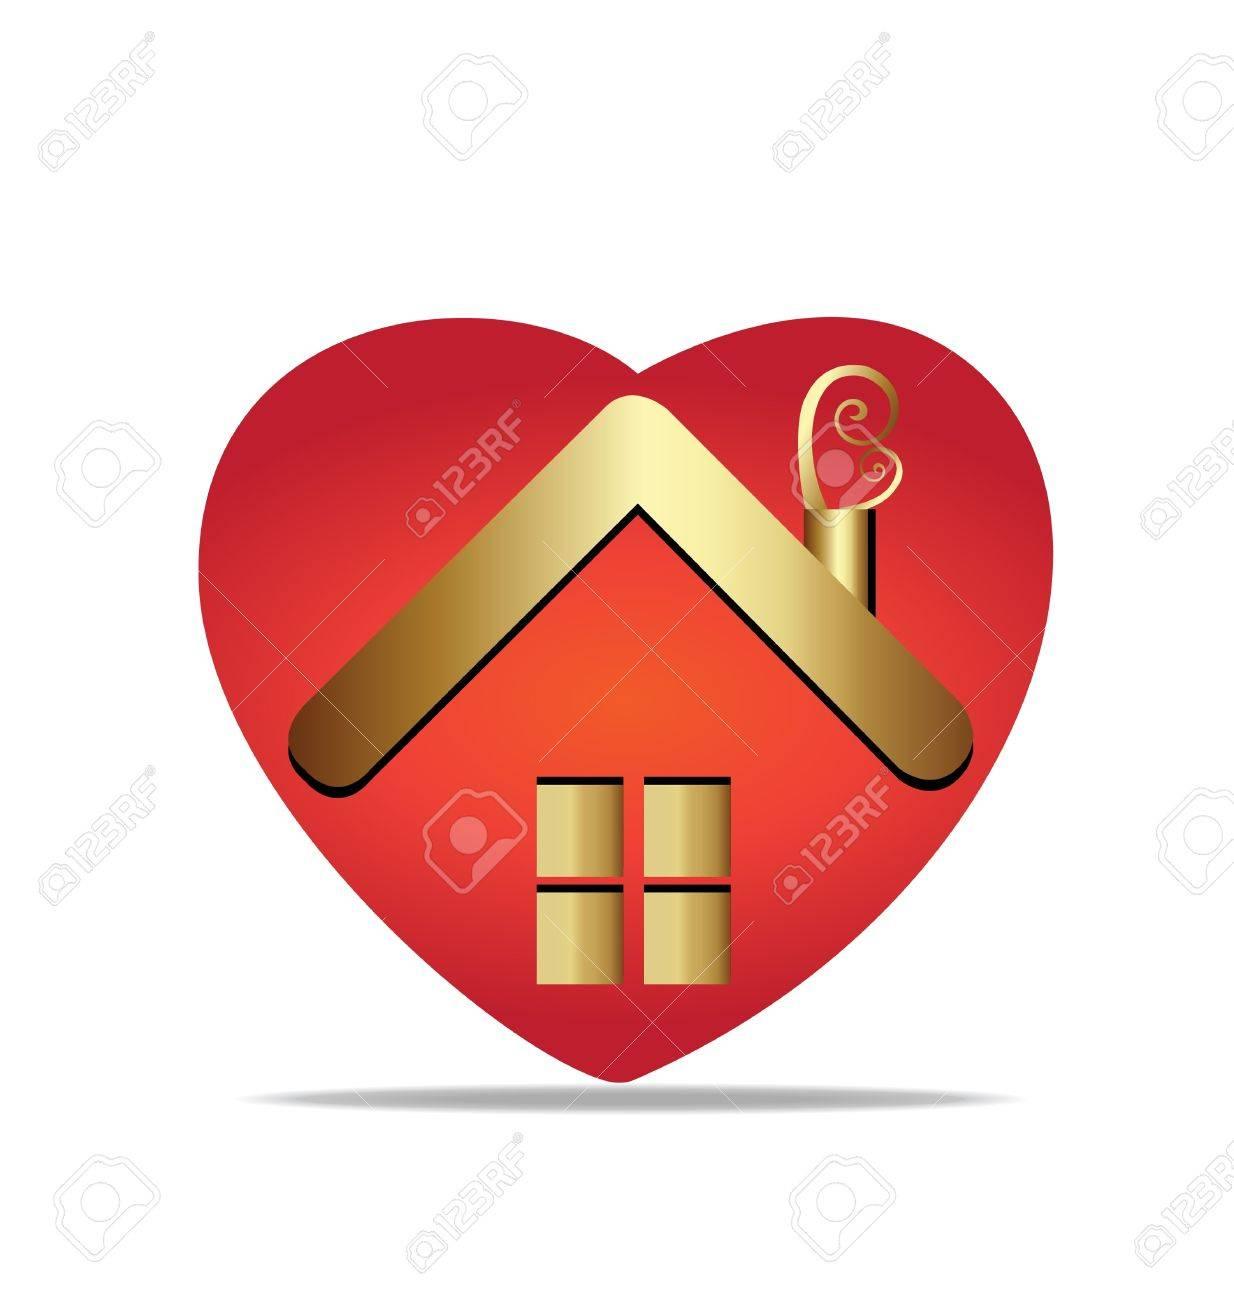 Gold house and heart logo vector Stock Vector - 16320521